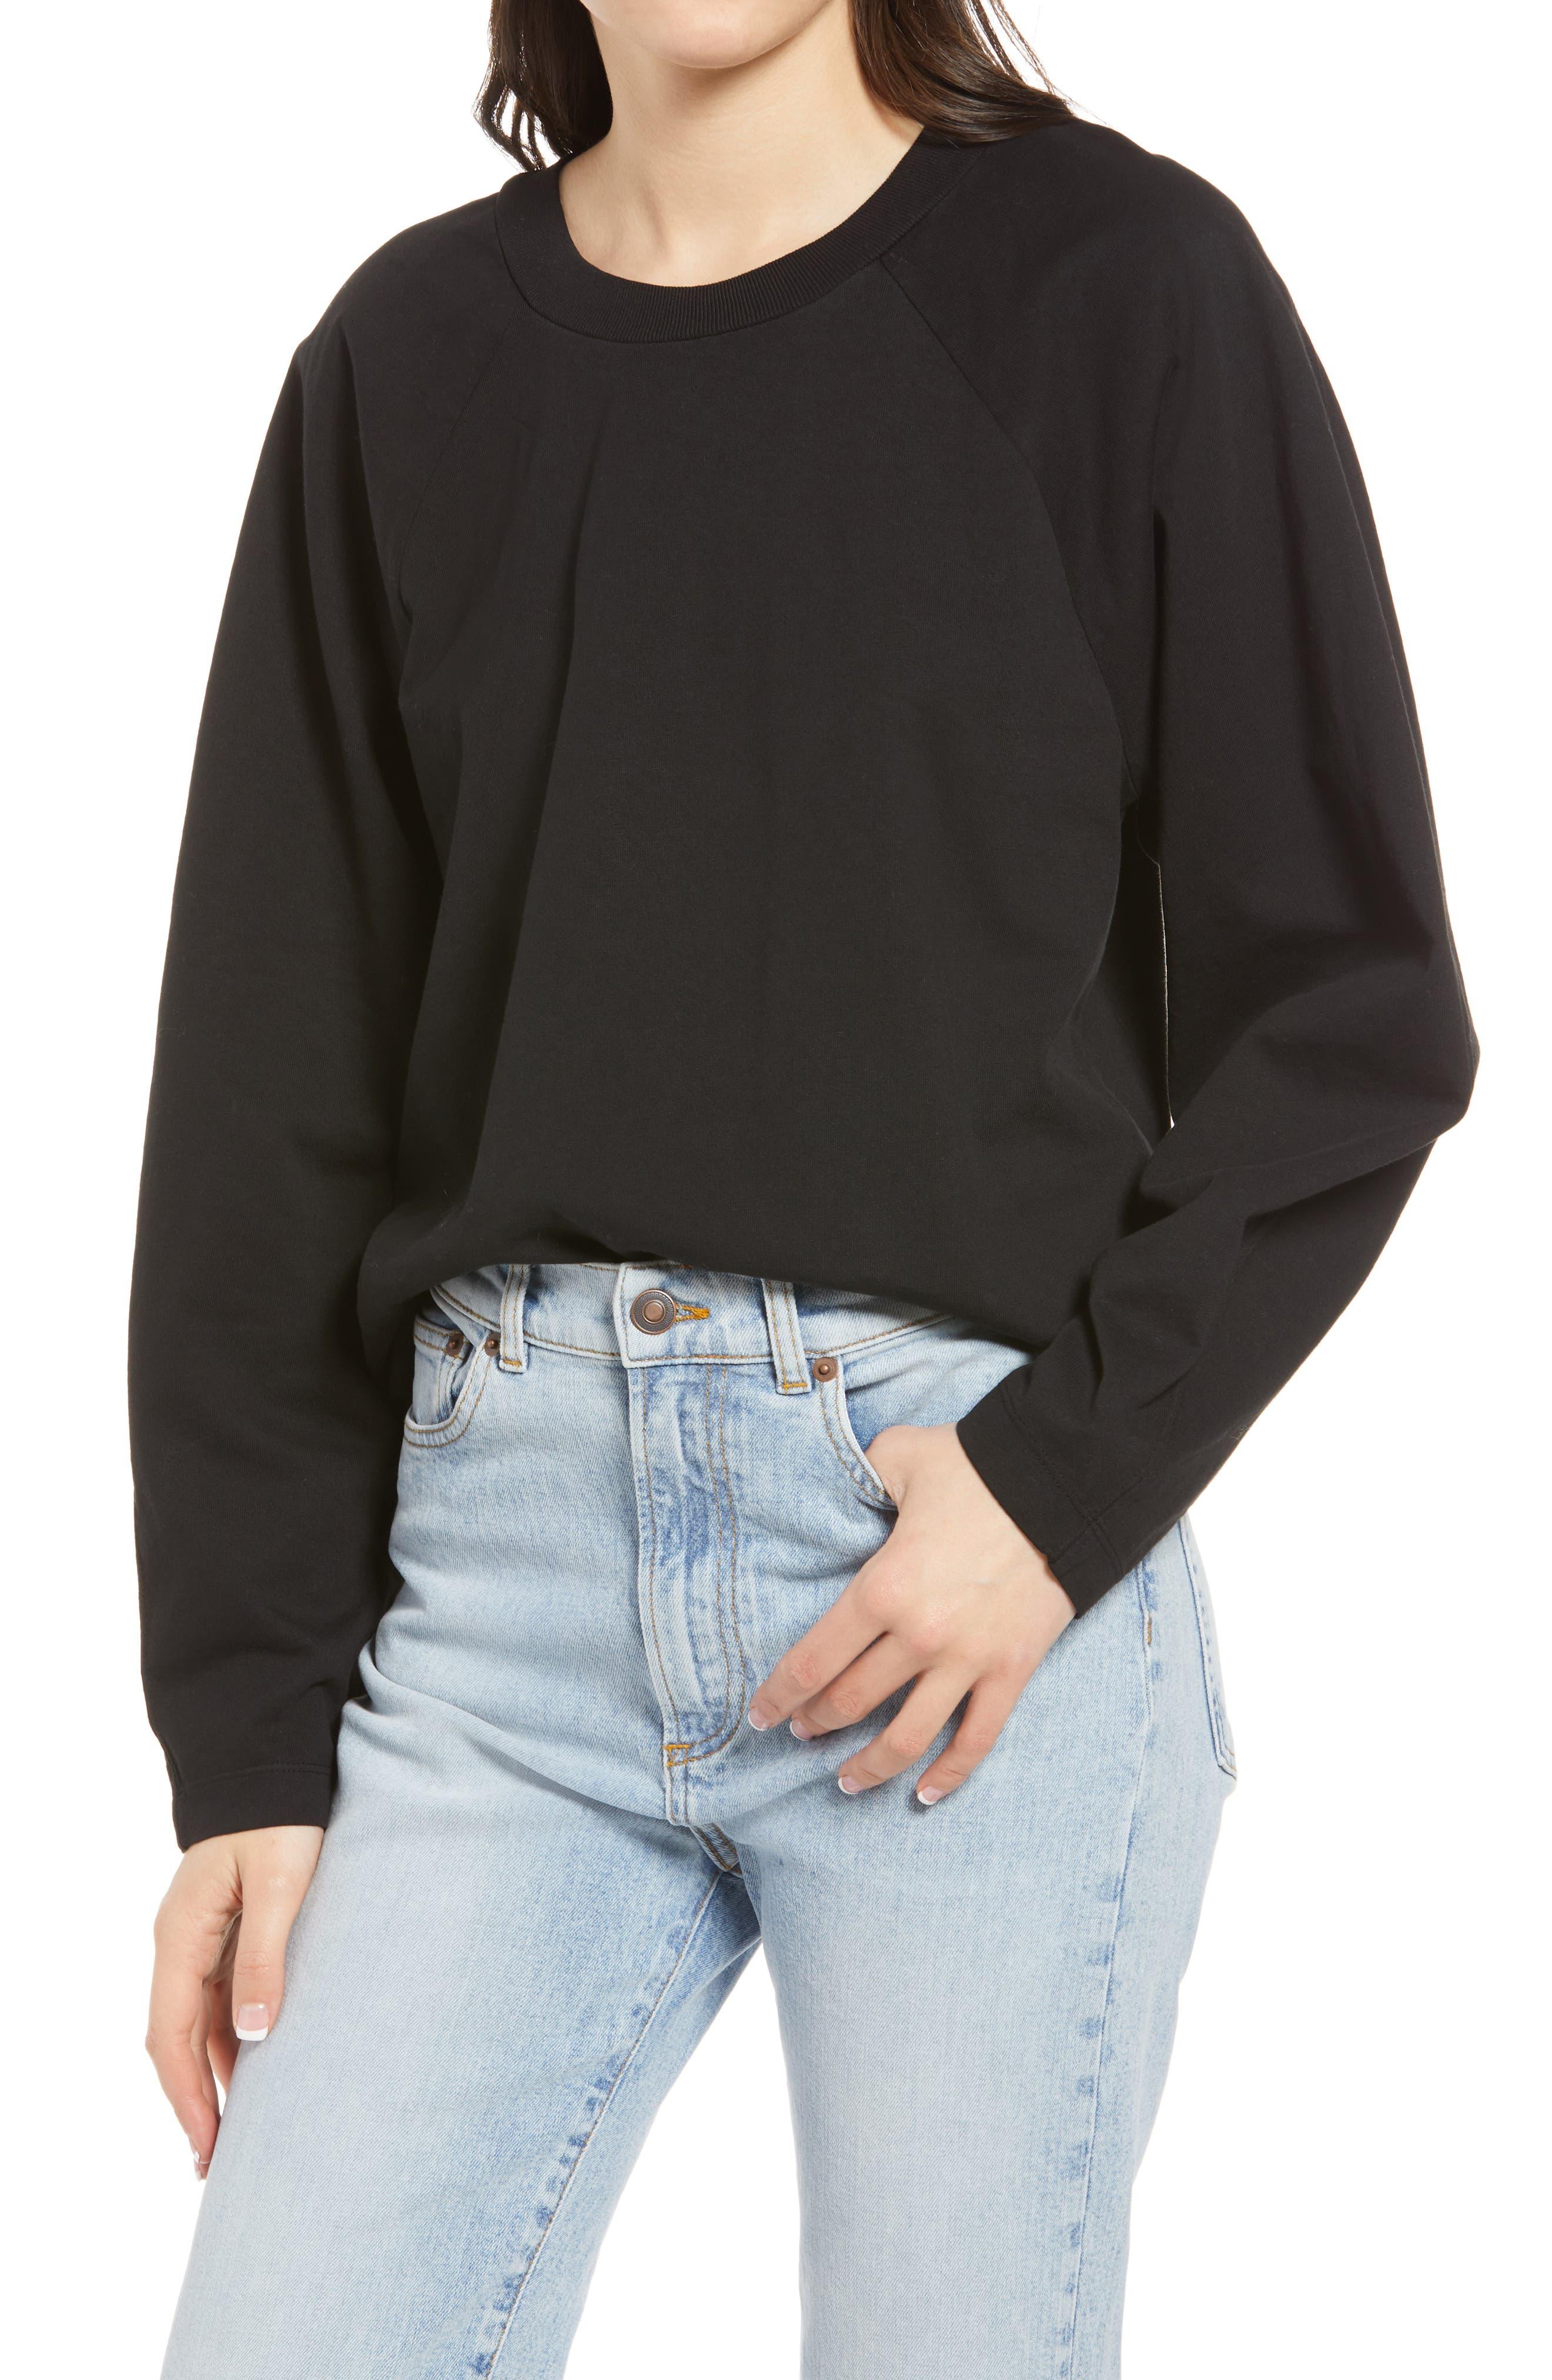 JEANERICA Organic Cotton T-Shirt